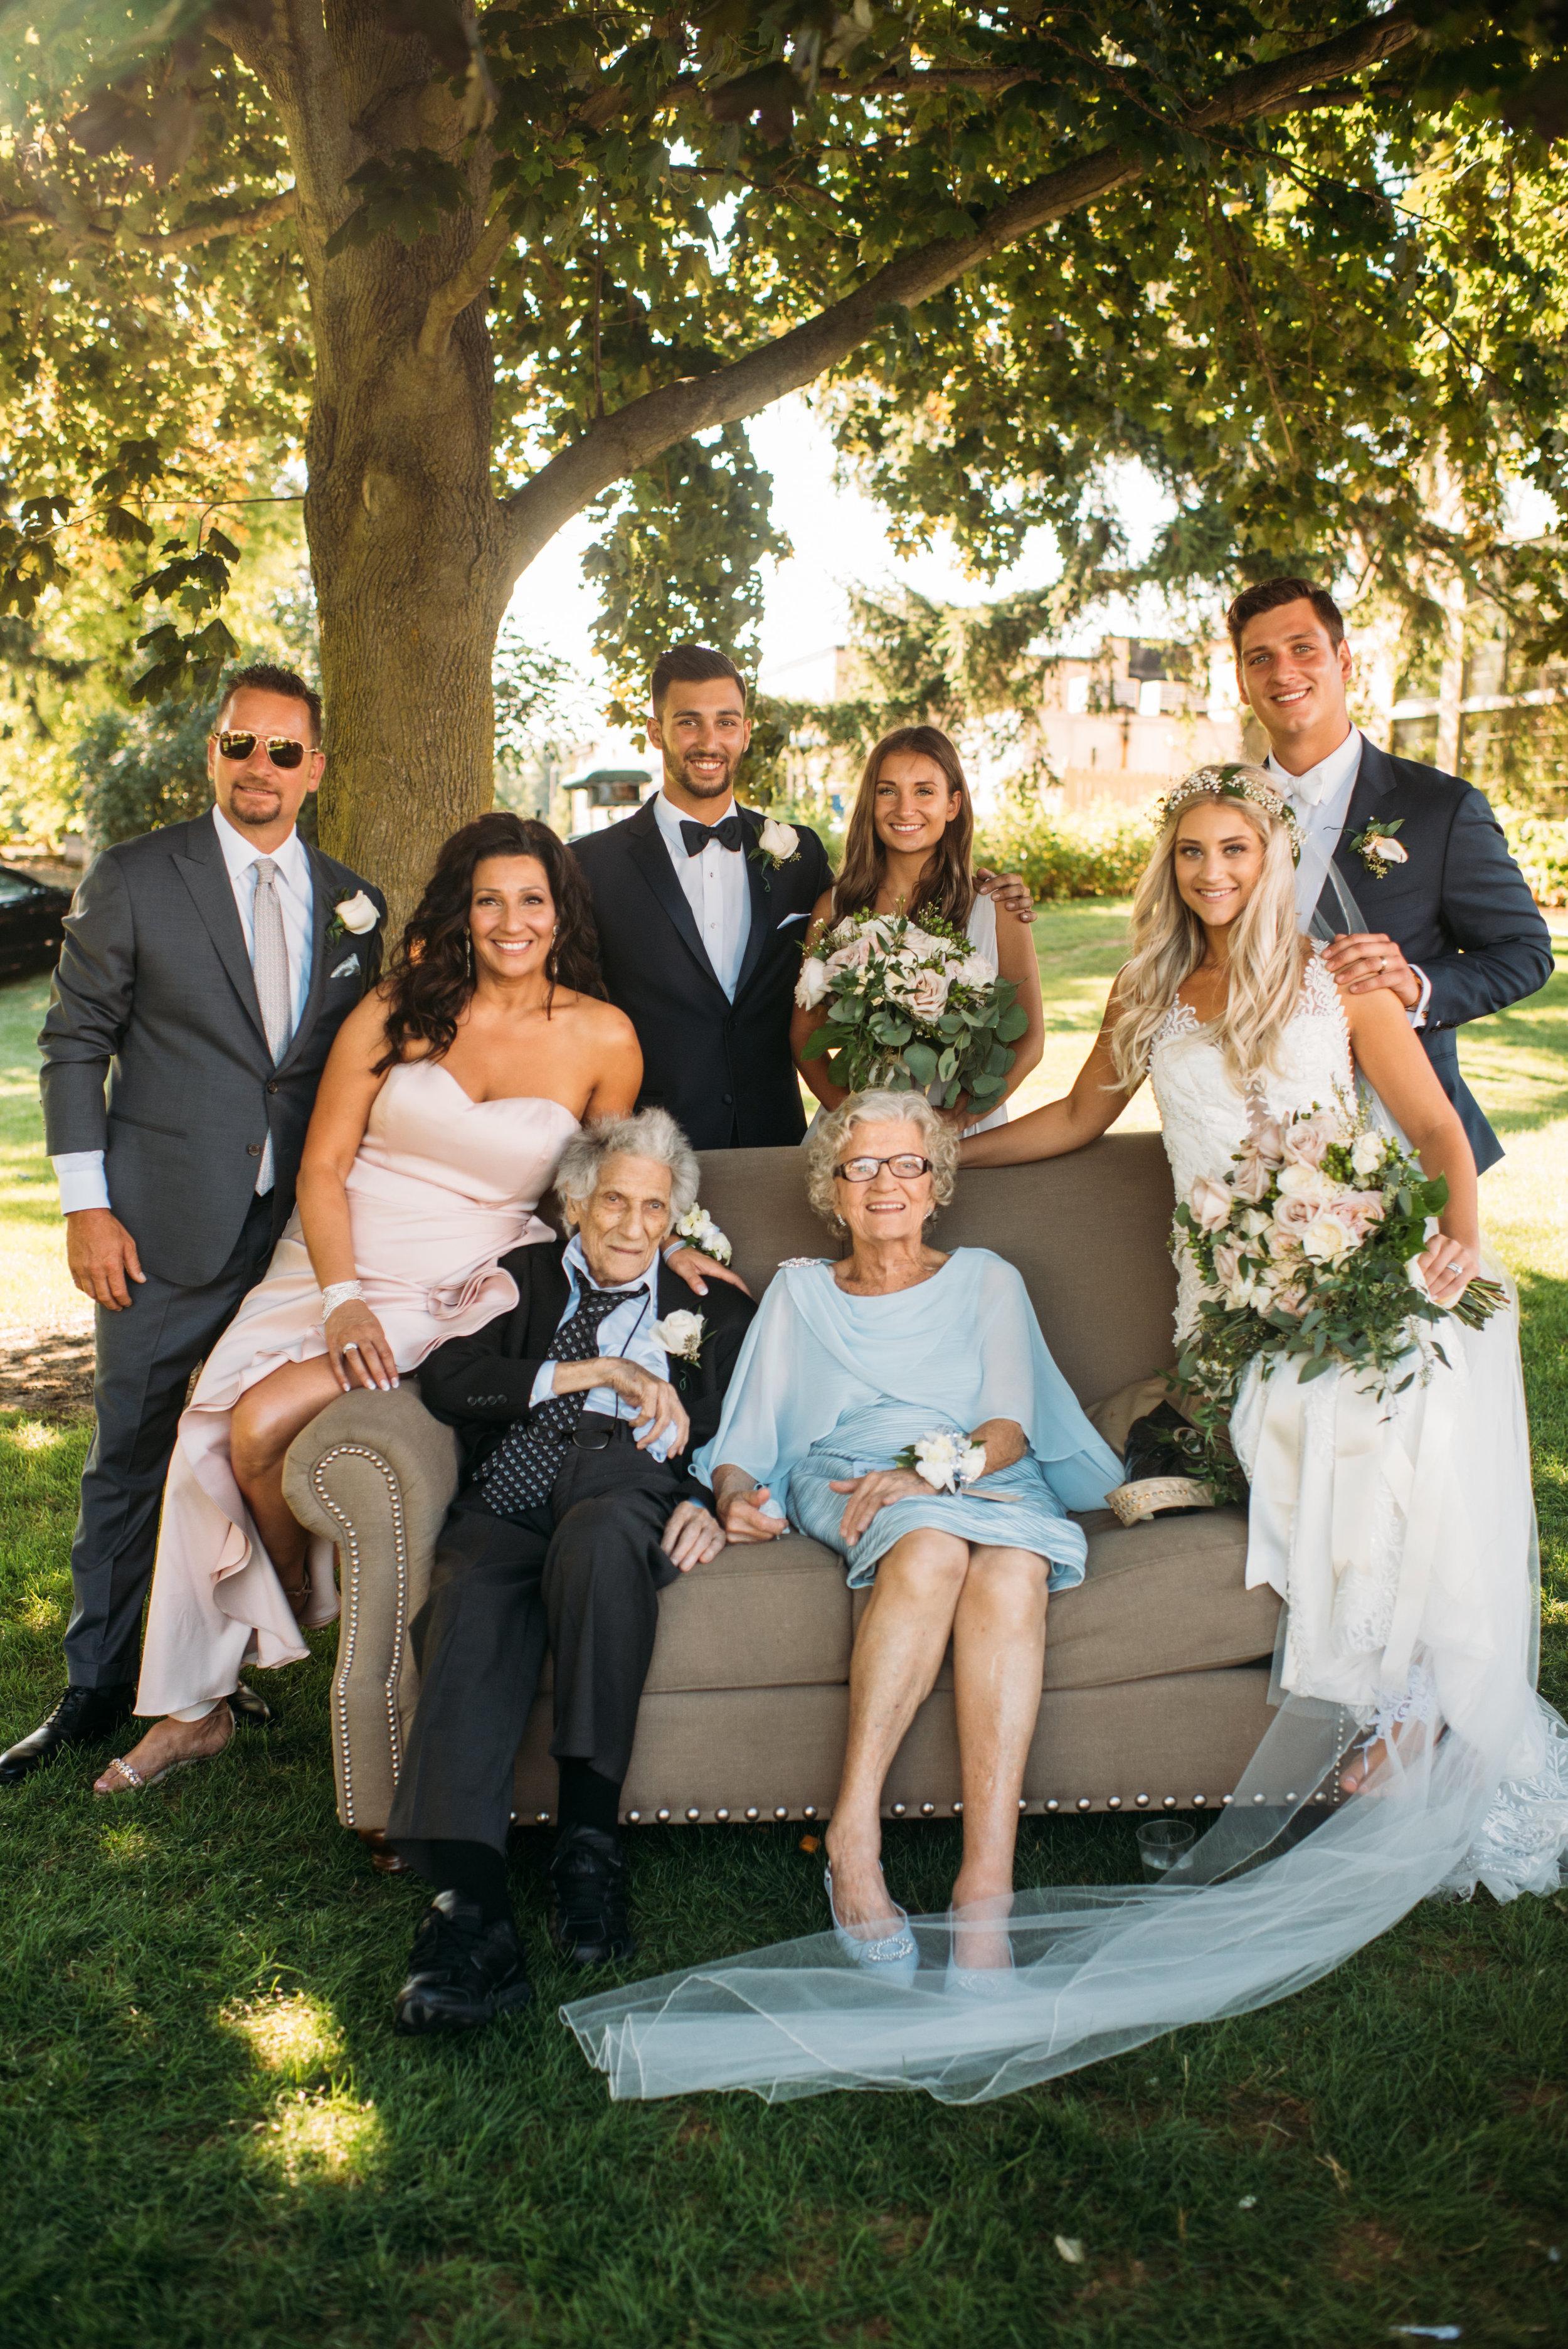 Jon Lia wedding day-Family Portraits Cocktail Hour-0035.jpg